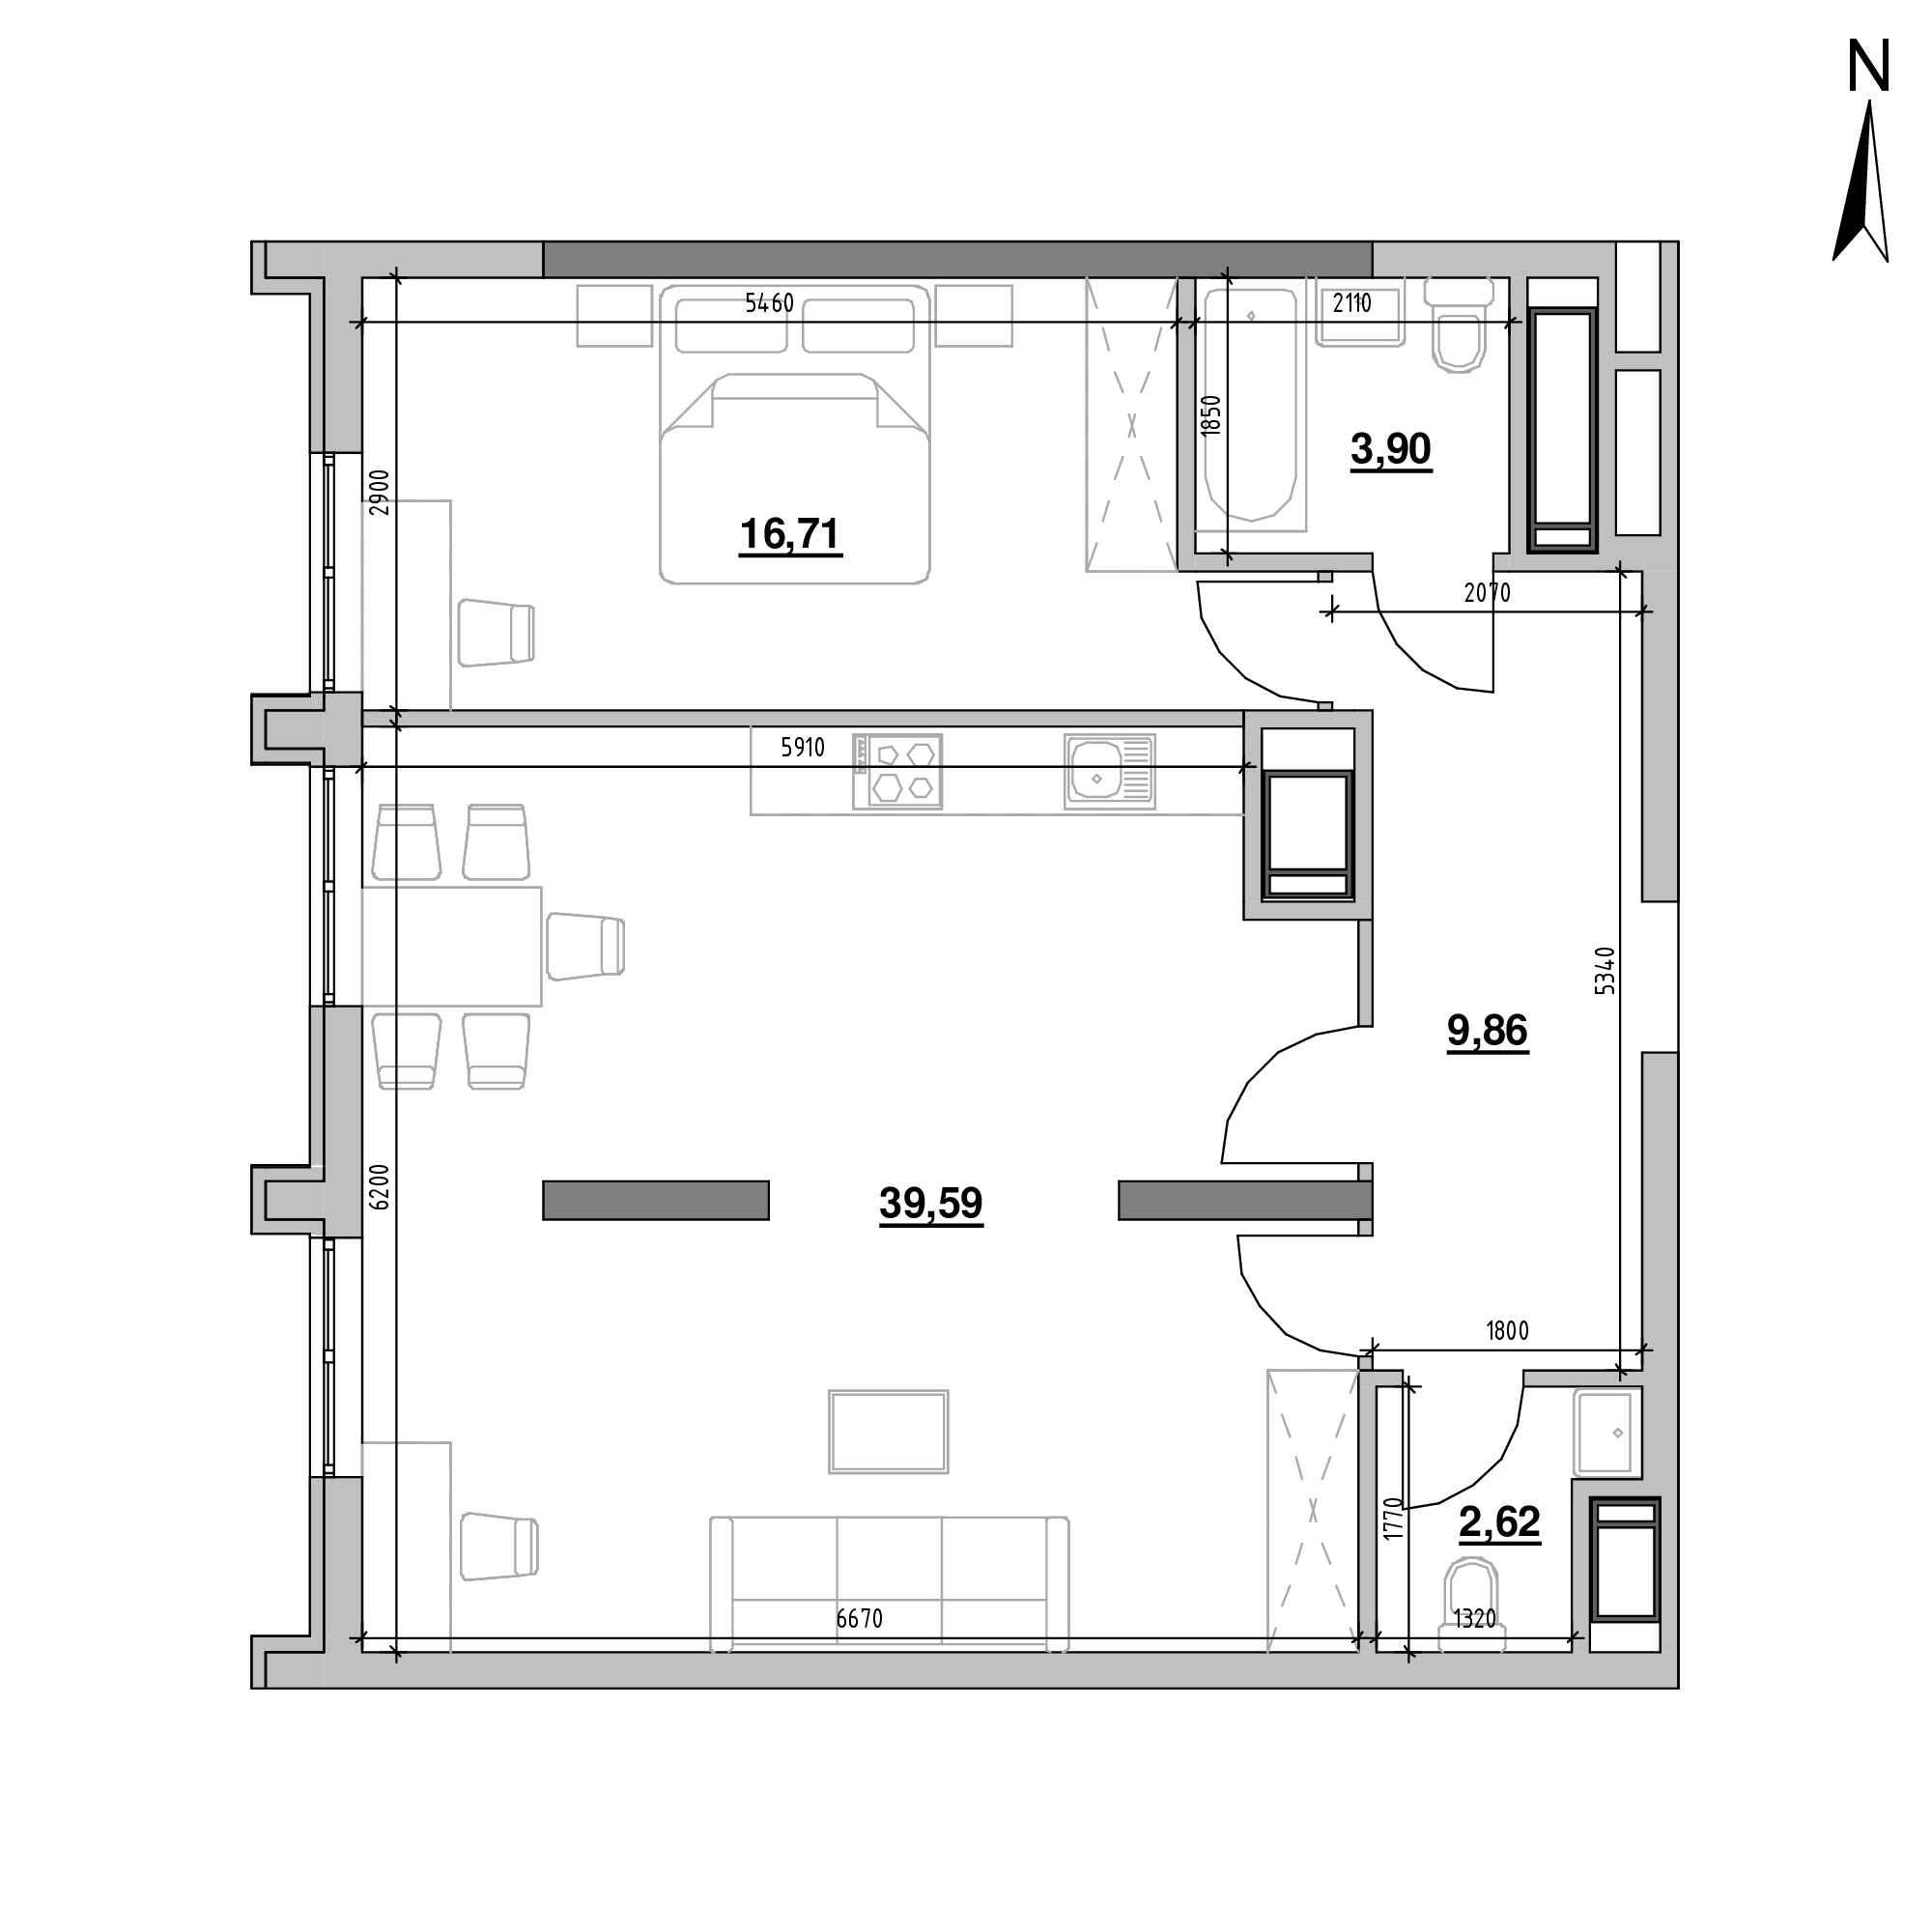 ЖК Nordica Residence: планування 1-кімнатної квартири, №41, 72.68 м<sup>2</sup>